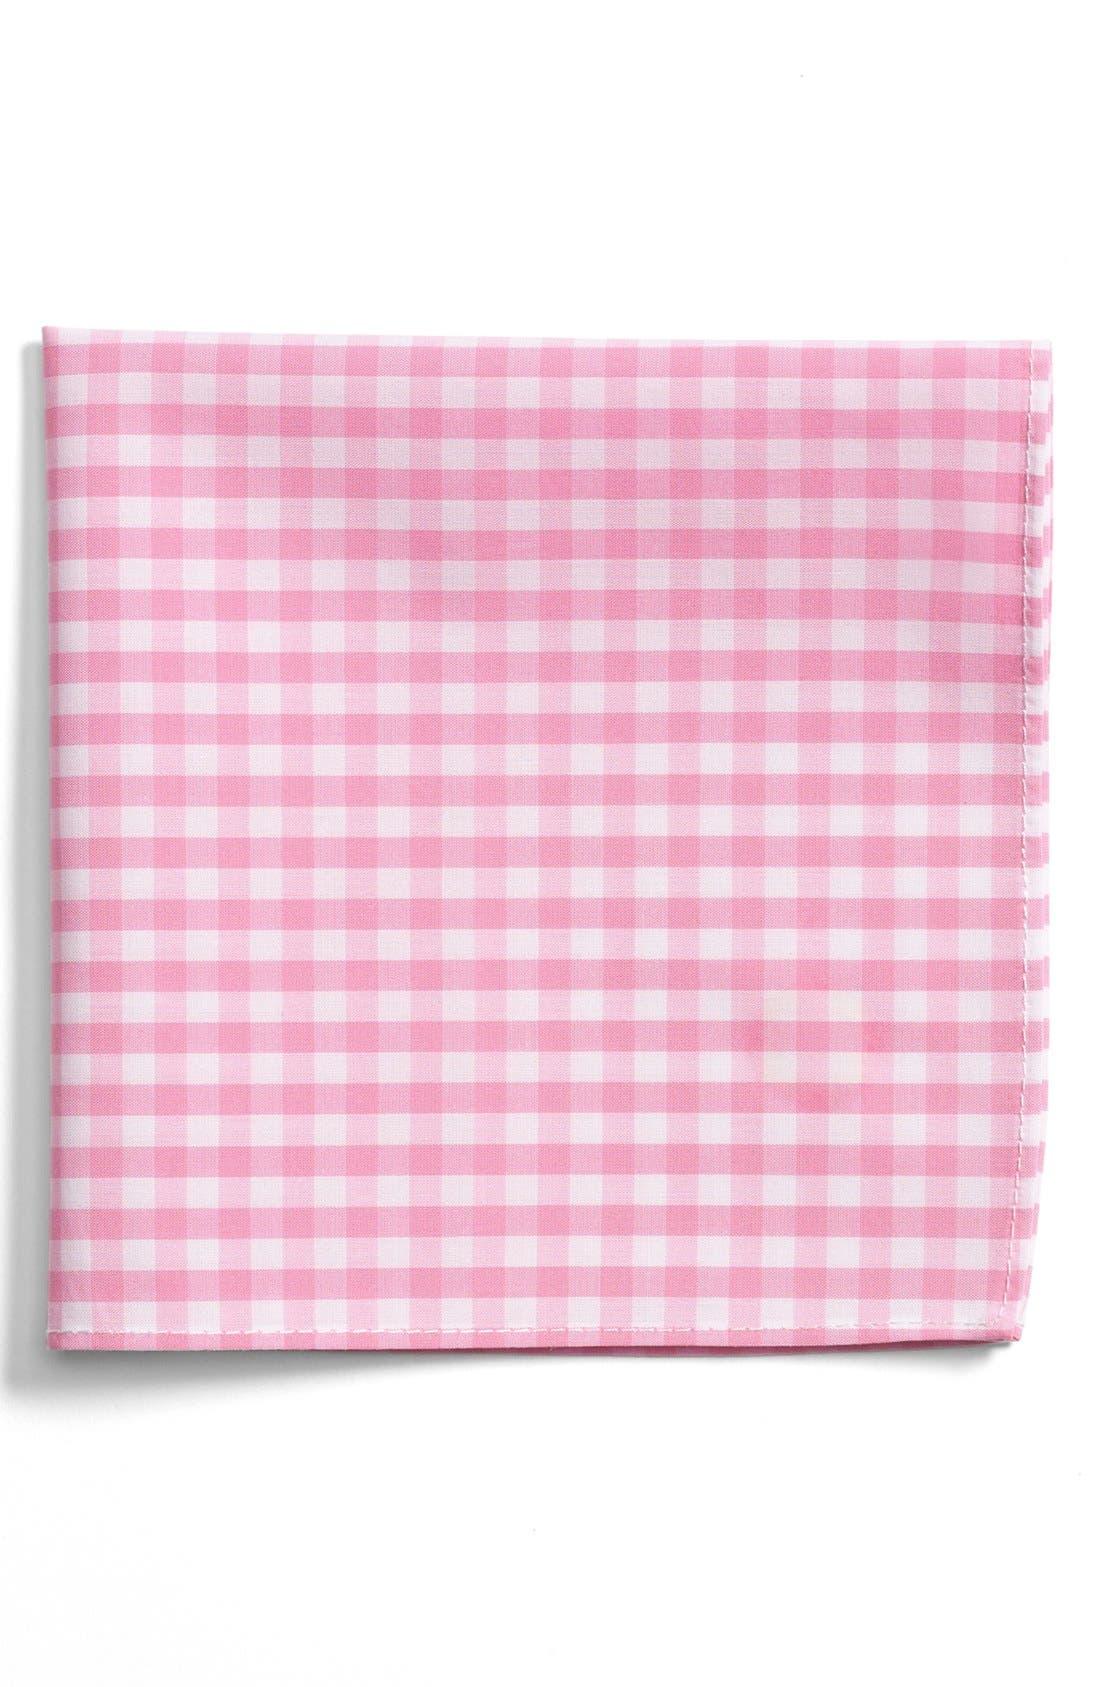 Gingham Cotton Pocket Square,                             Main thumbnail 1, color,                             Pink